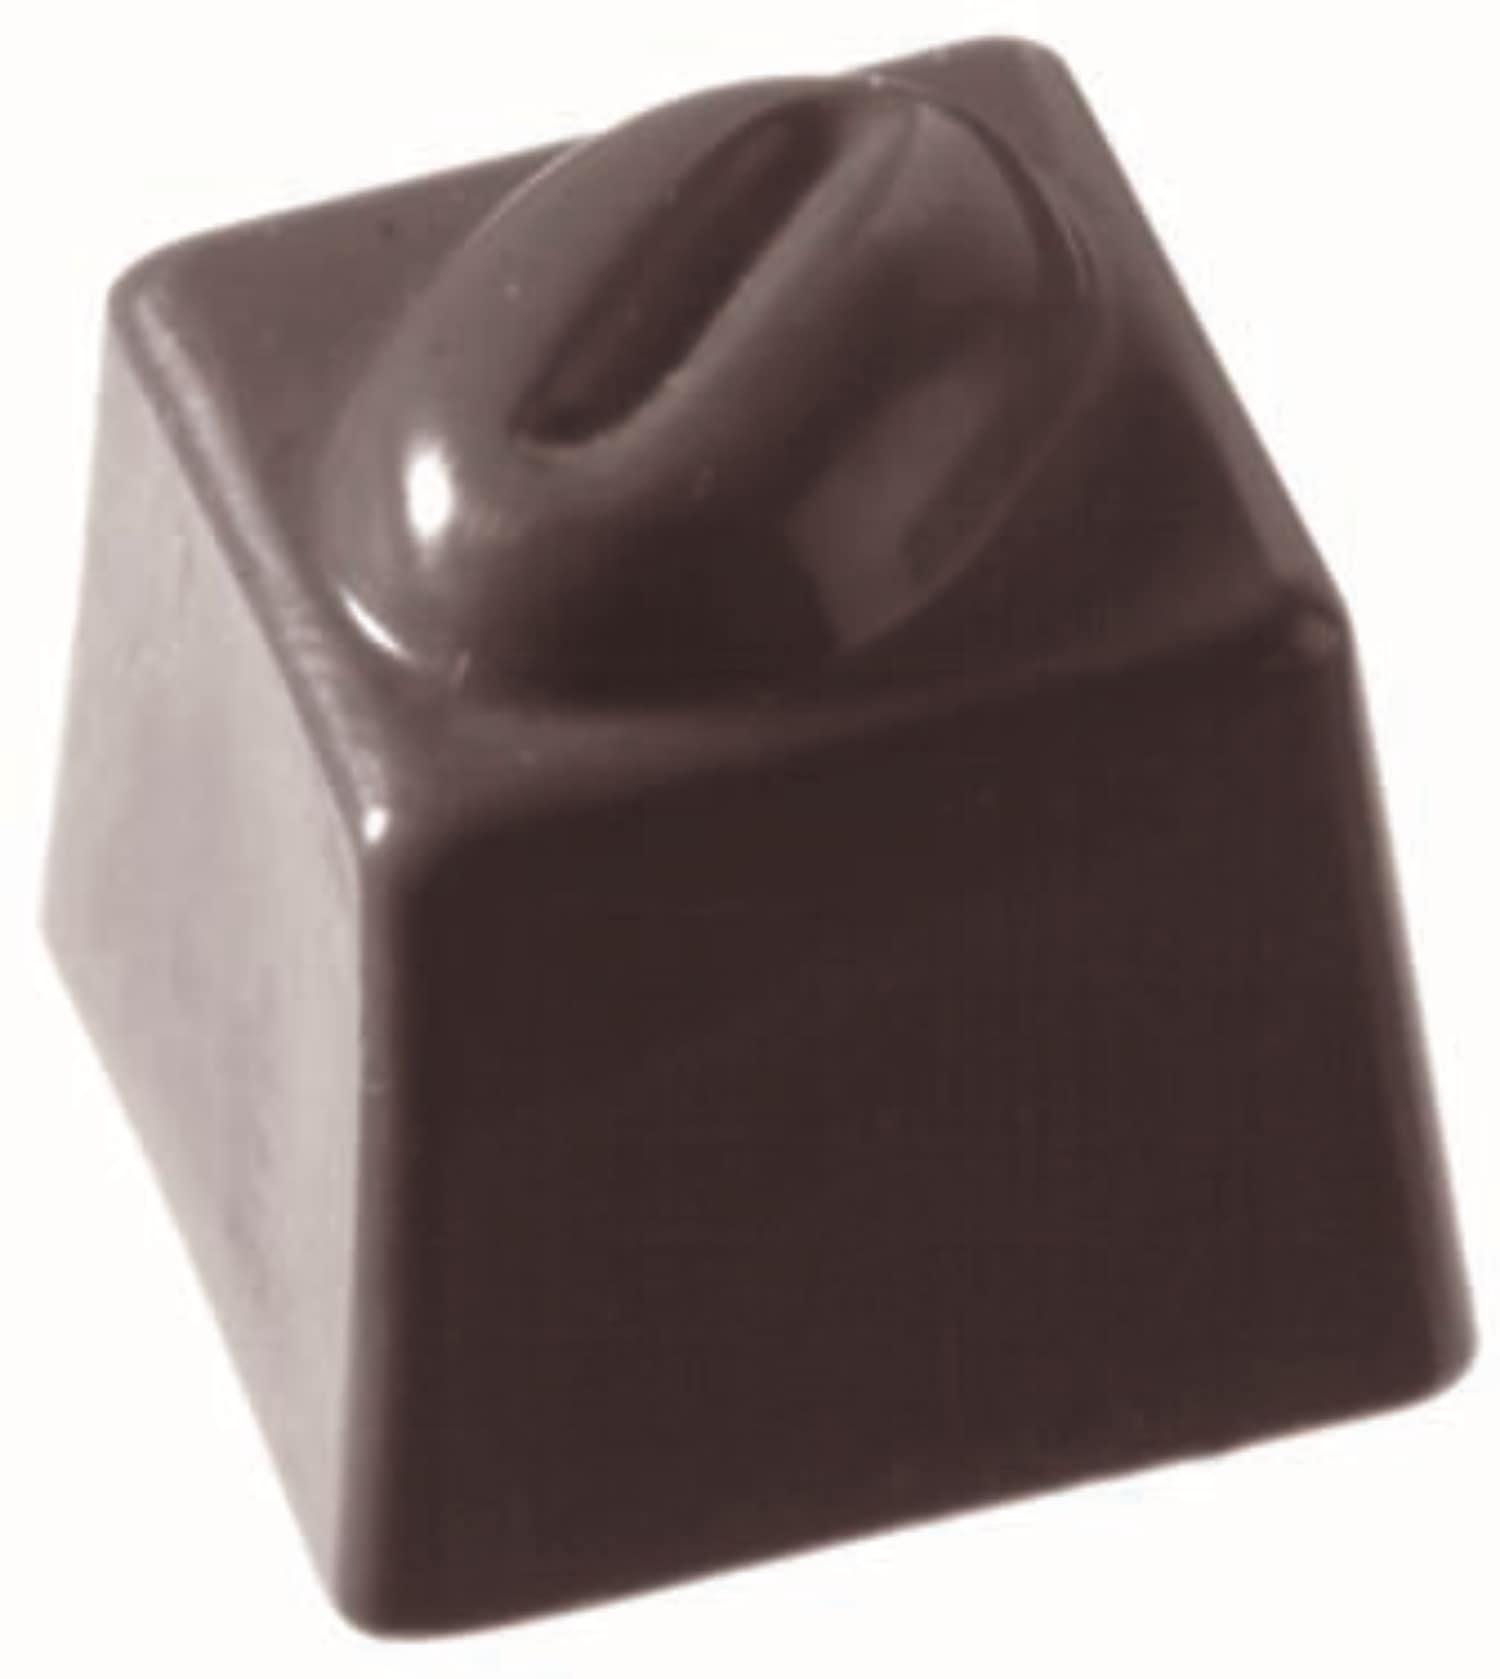 "Schokoladenform ""Kaffeebohne"" 421019"